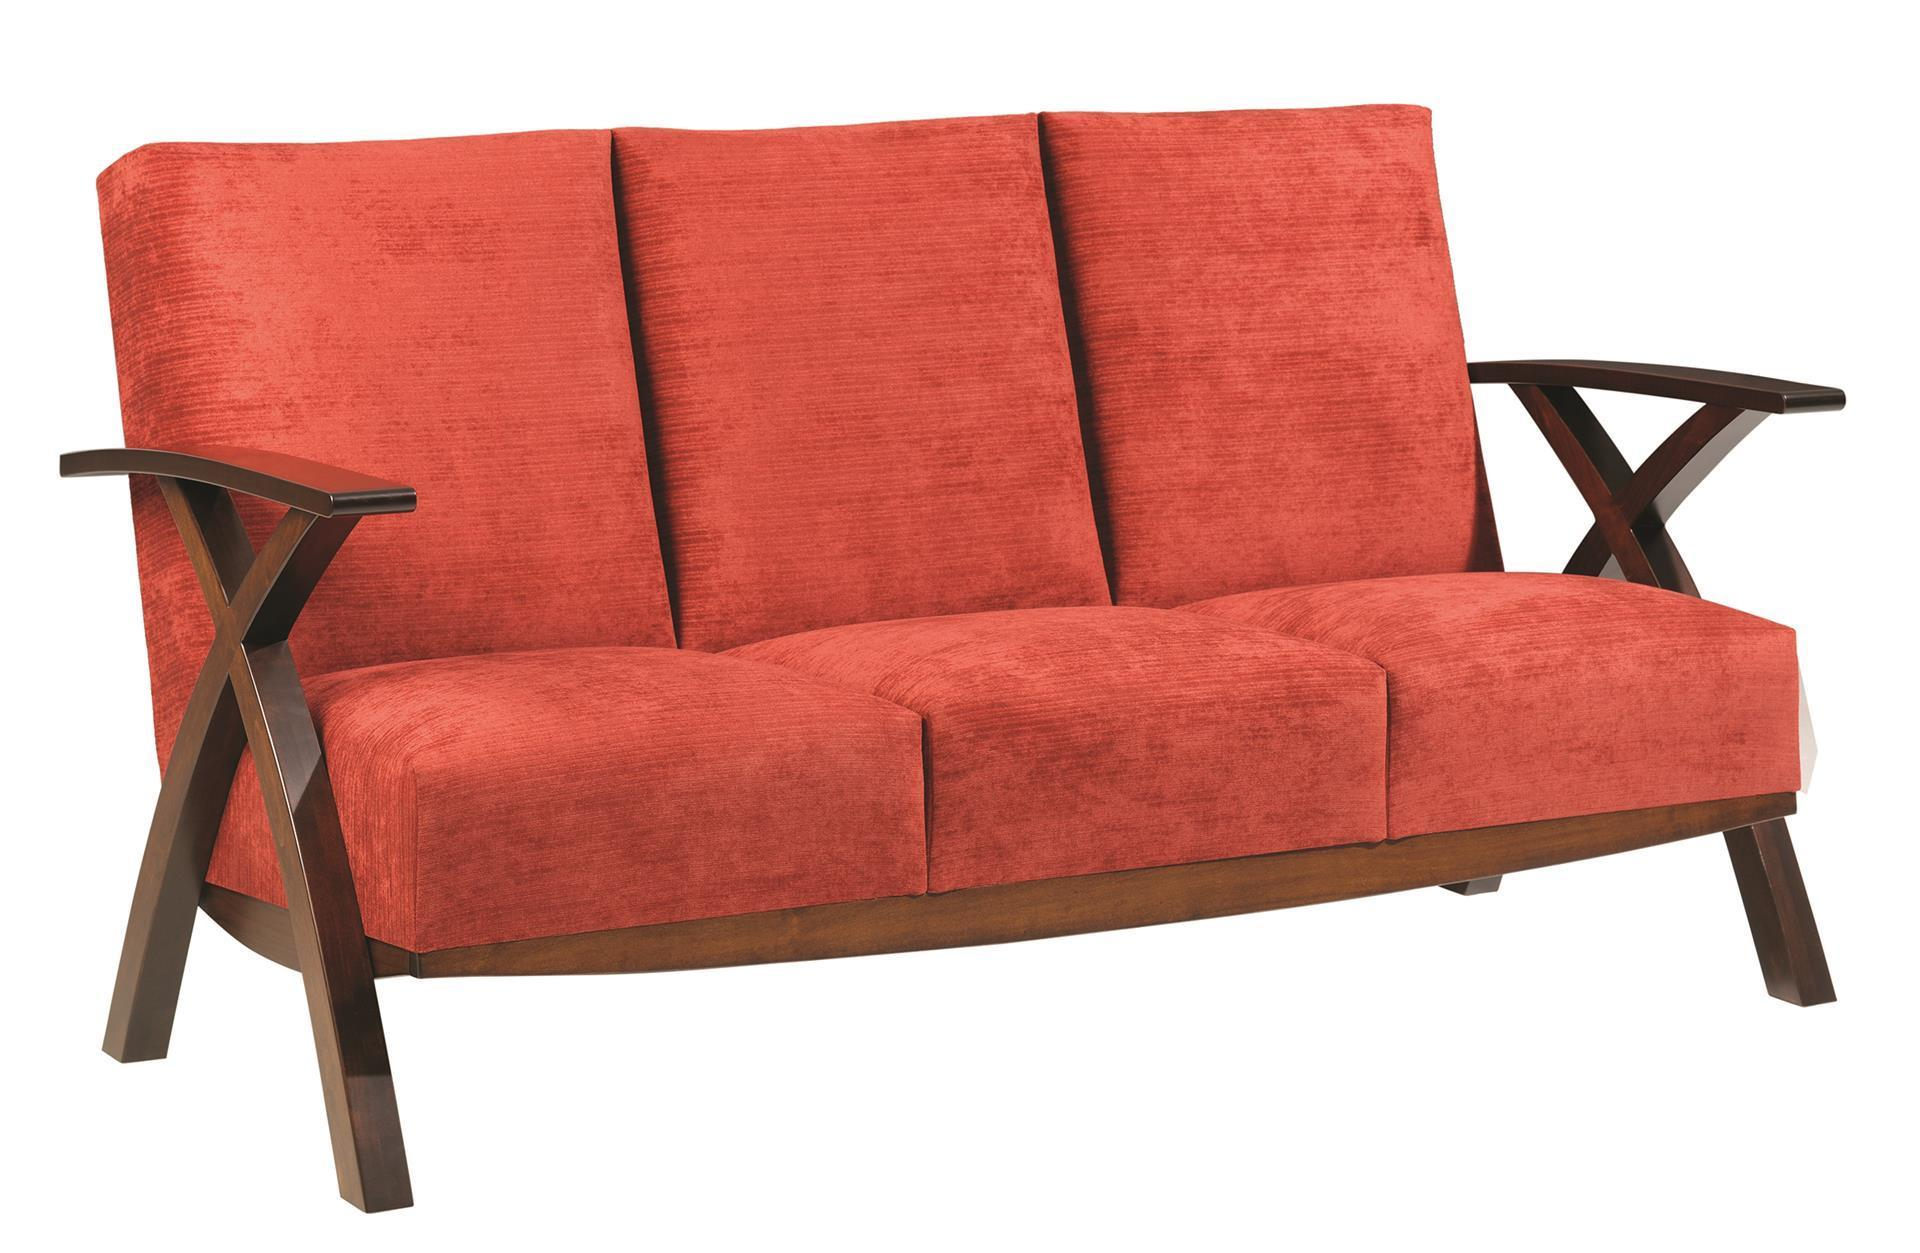 Amish furniture of bristol - Amish Furniture Of Bristol 33